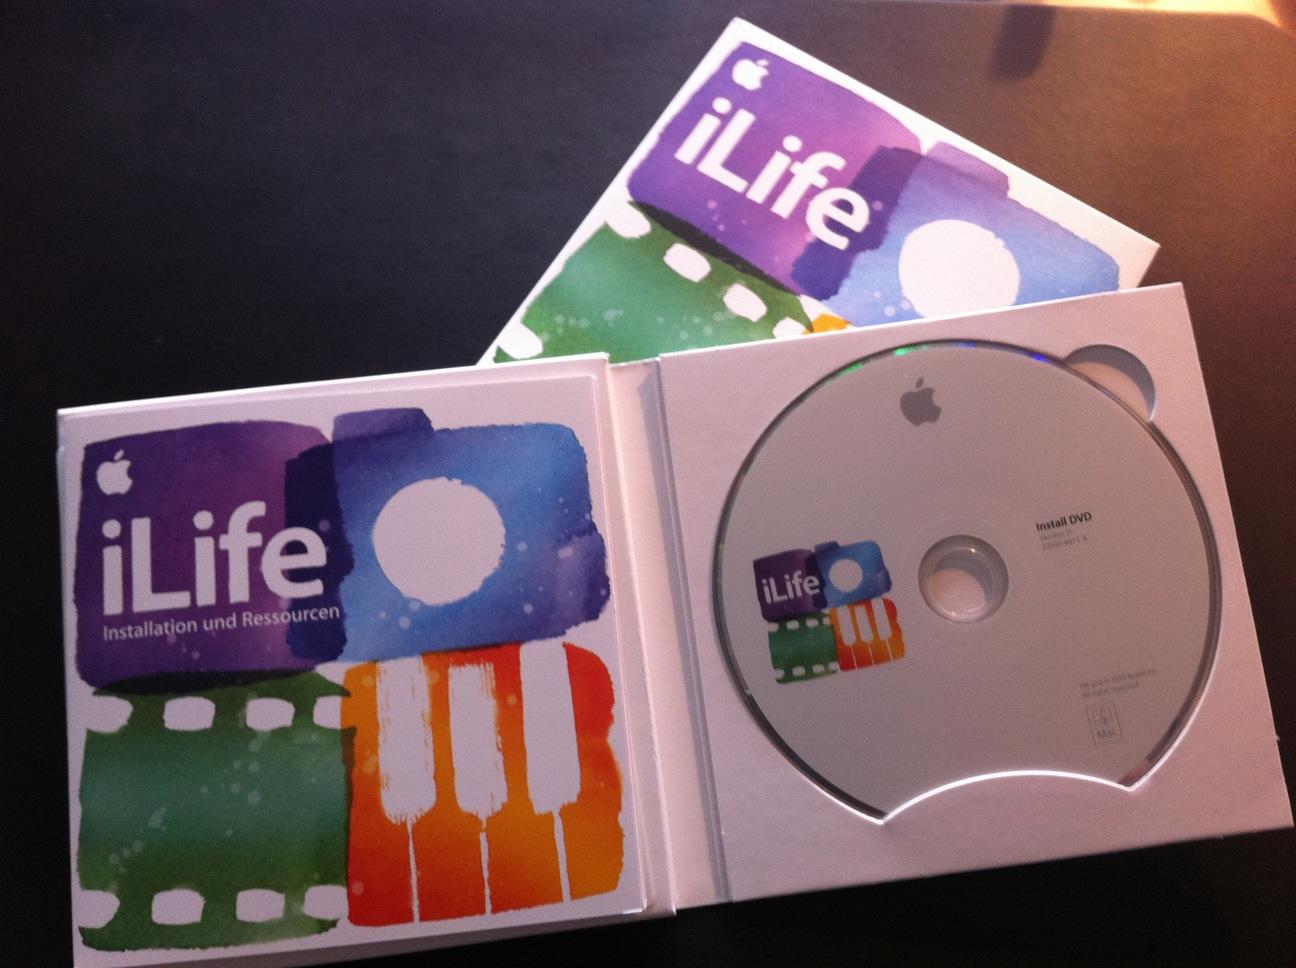 Ilife 06 Download - kagipu.services